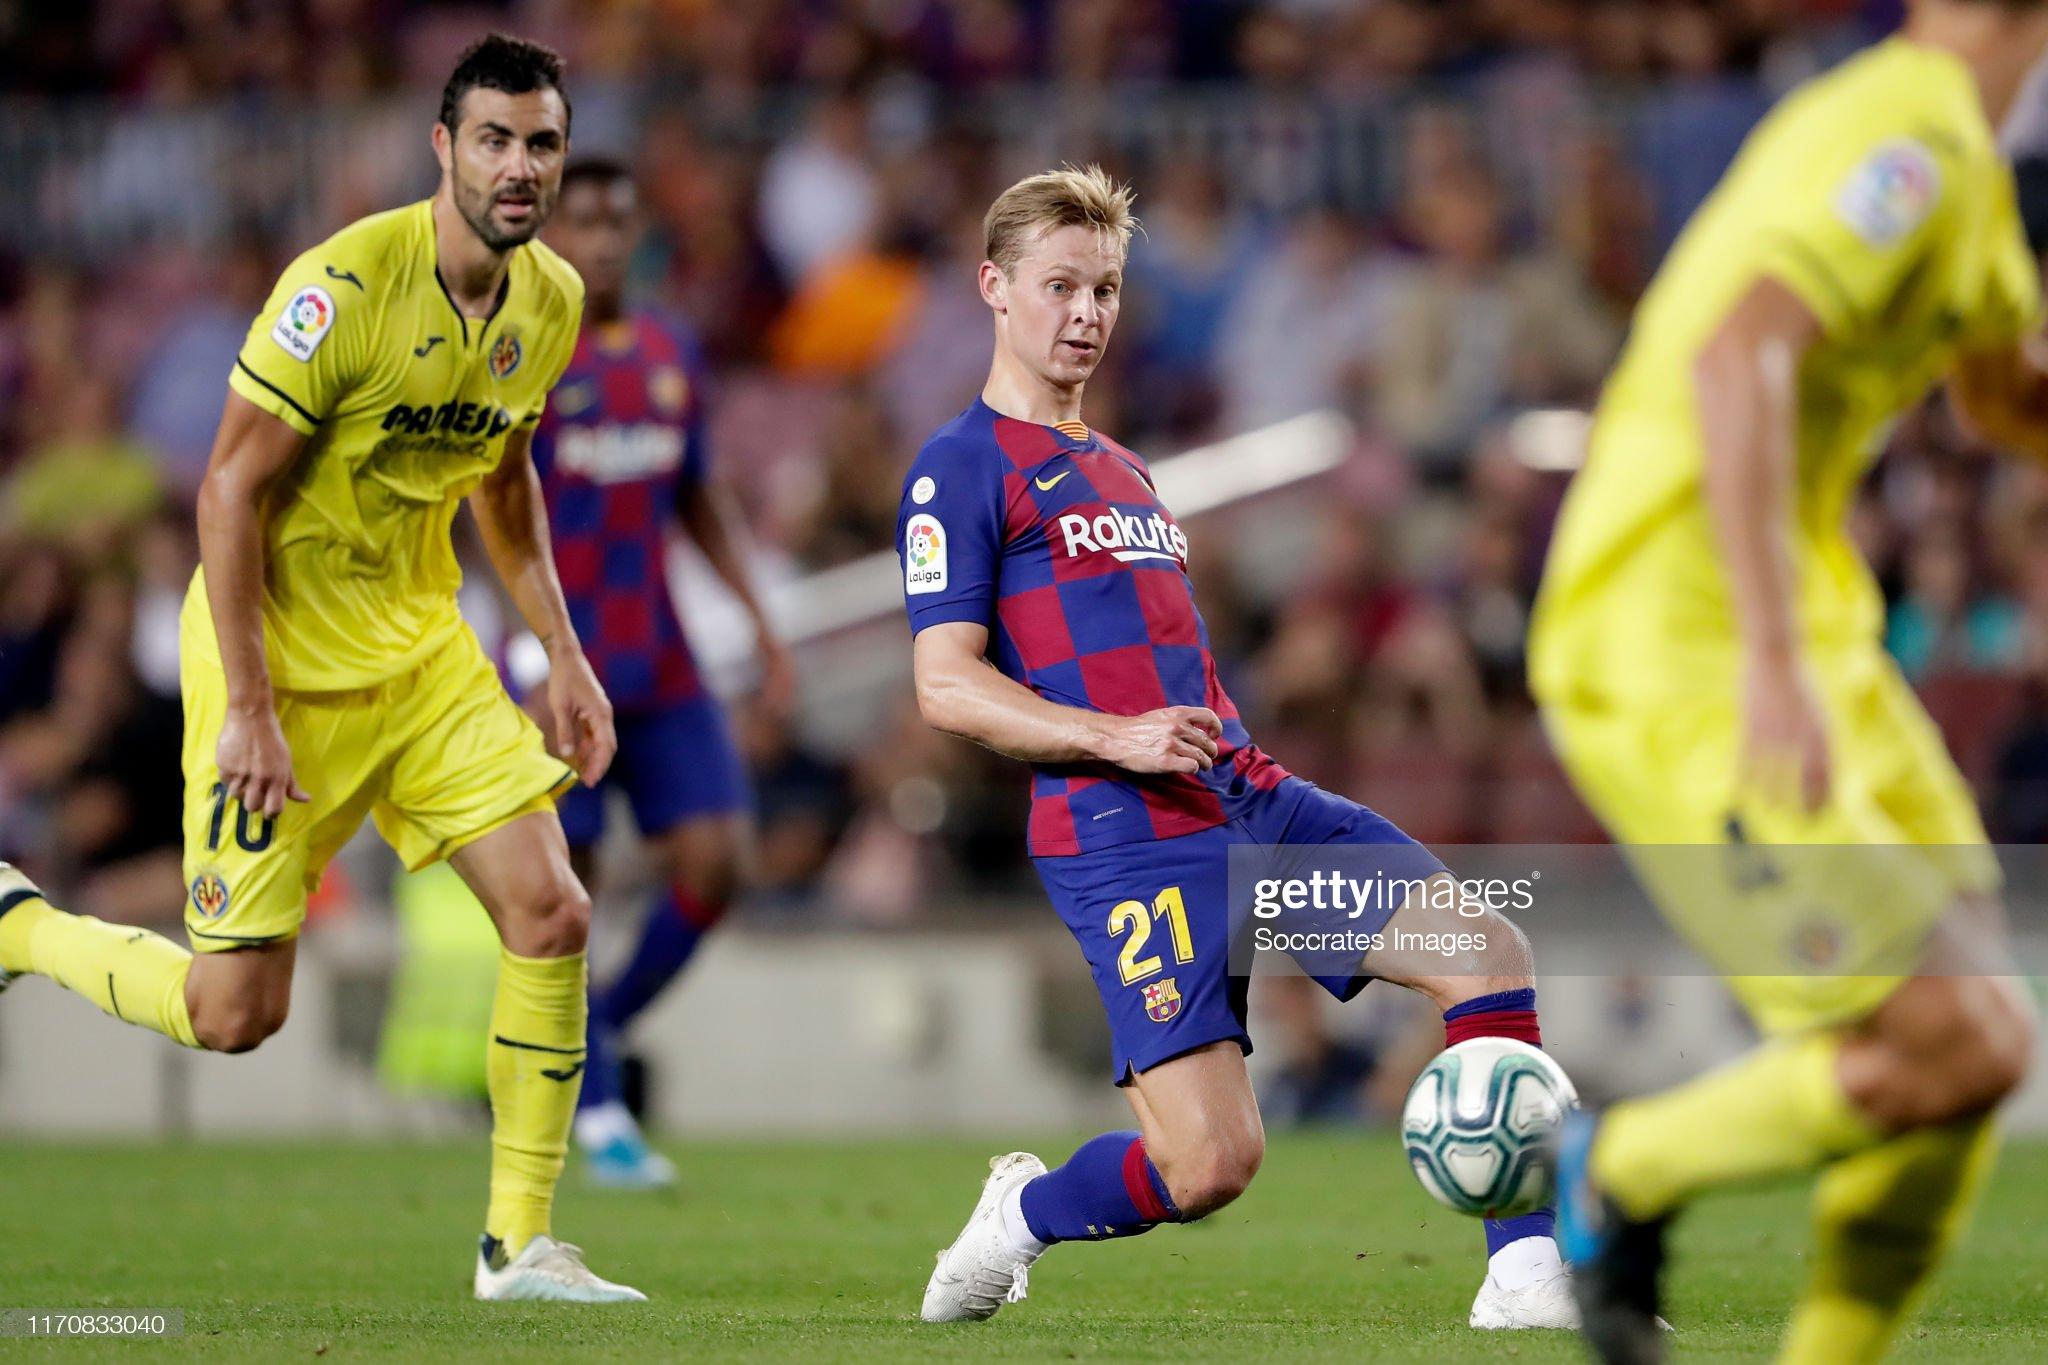 صور مباراة : برشلونة - فياريال 2-1 ( 24-09-2019 )  Frenkie-de-jong-of-fc-barcelona-during-the-la-liga-santander-match-picture-id1170833040?s=2048x2048